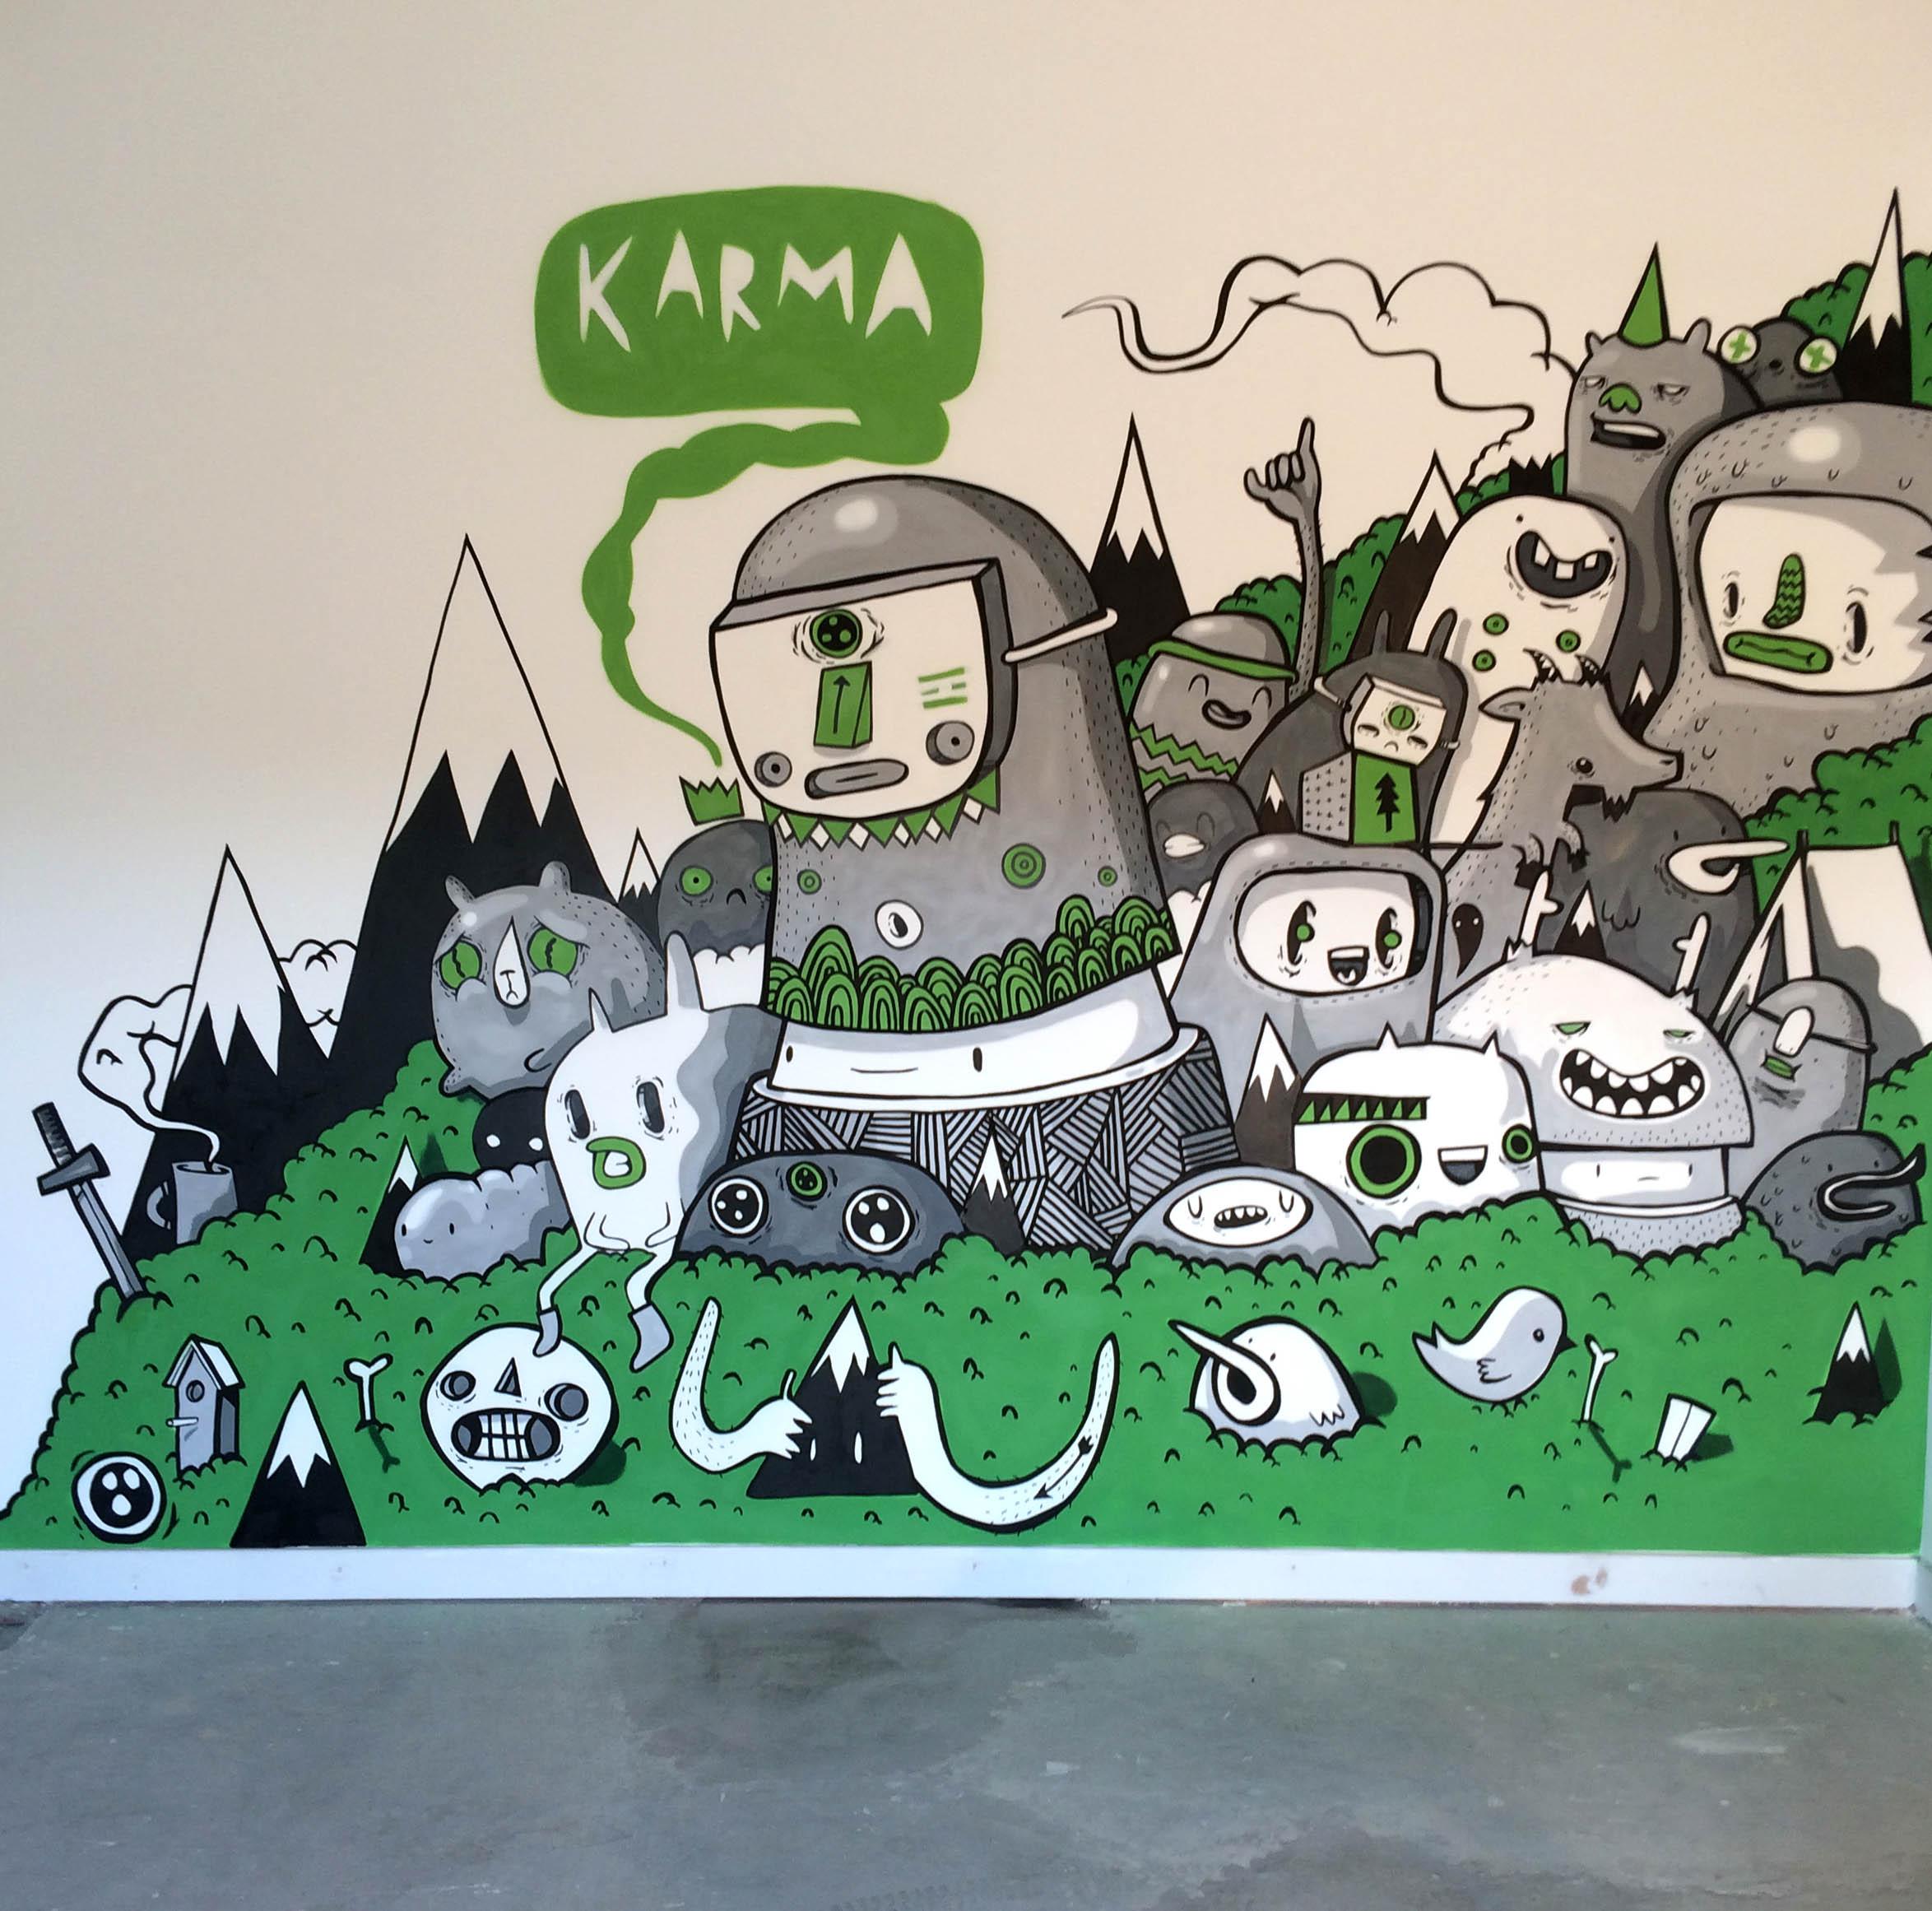 Karma Climbing Centre